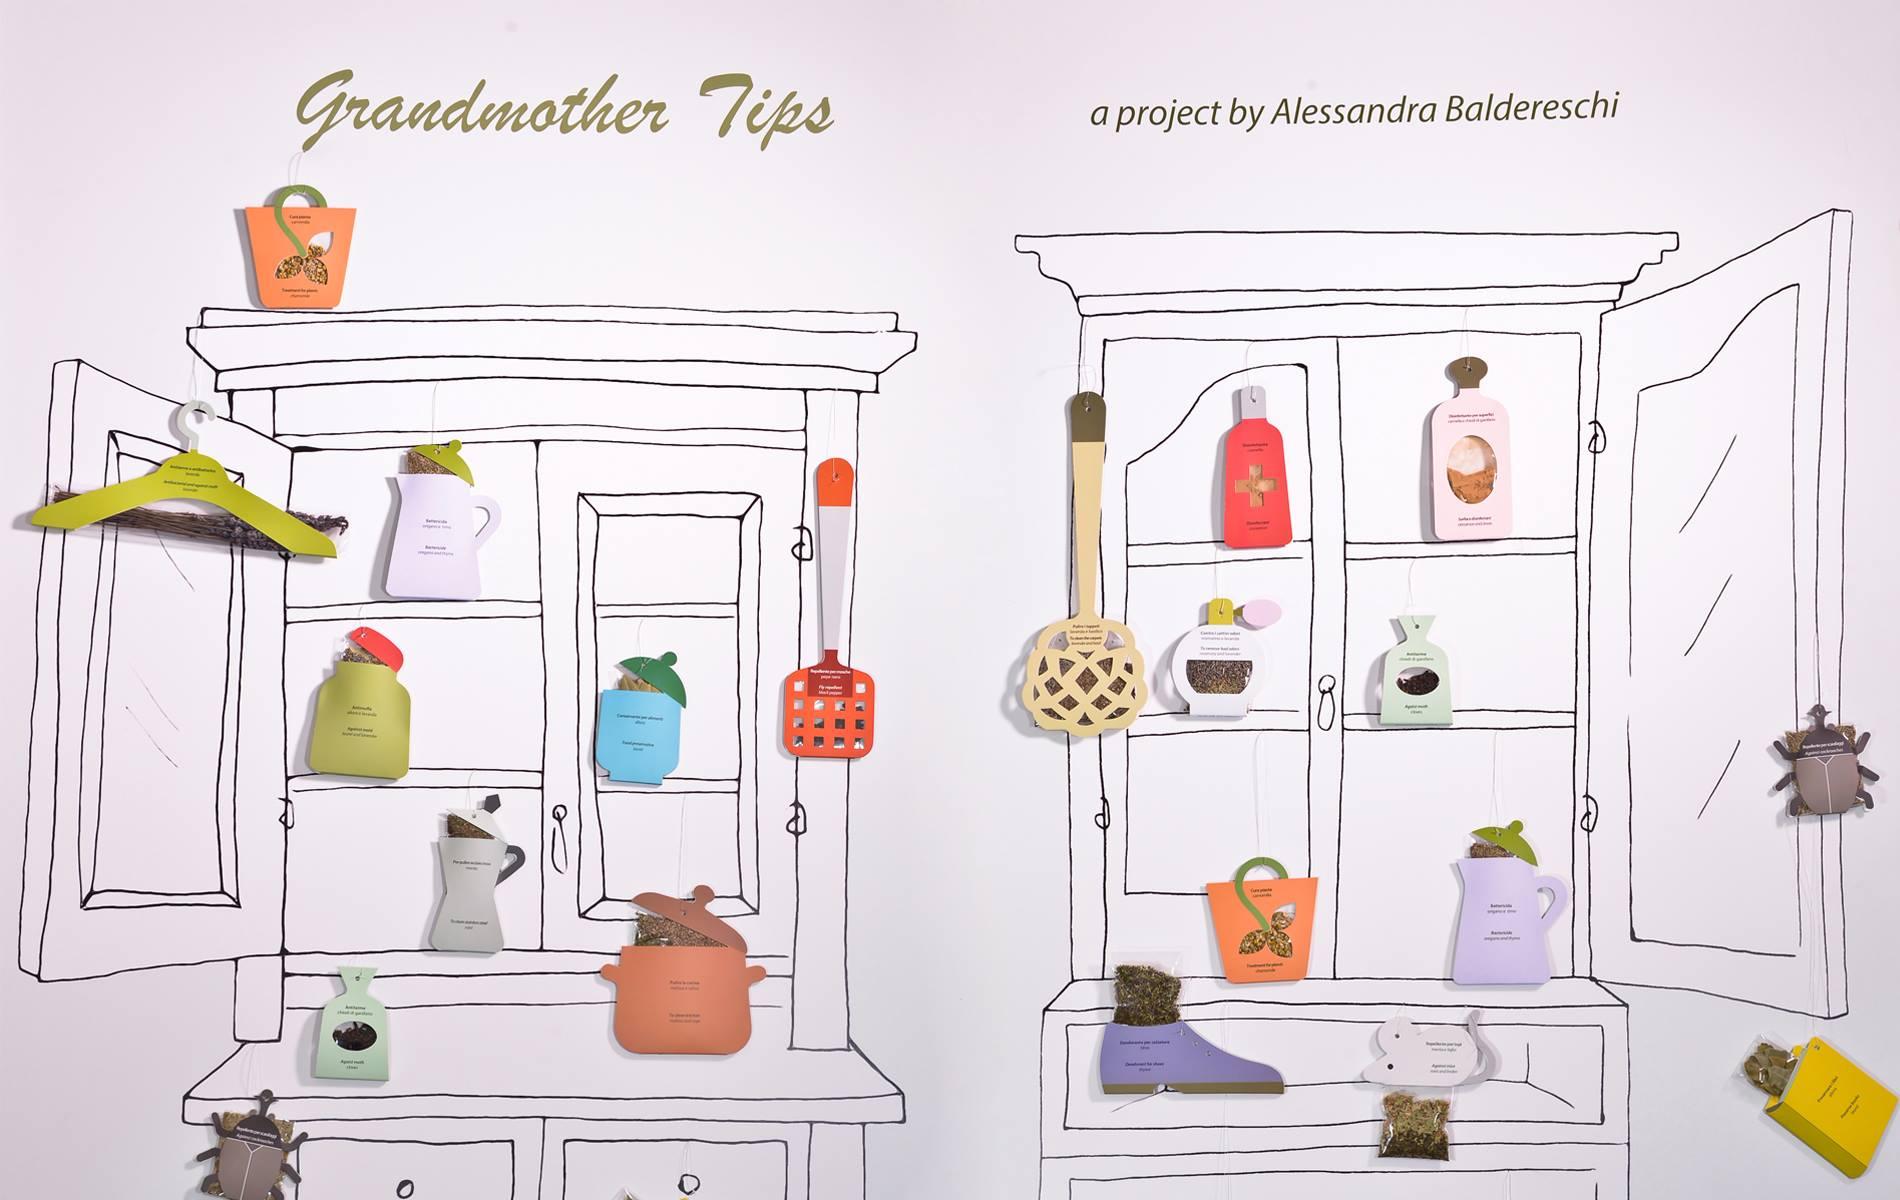 Grandmother Tips - Battericida Origano e Timo